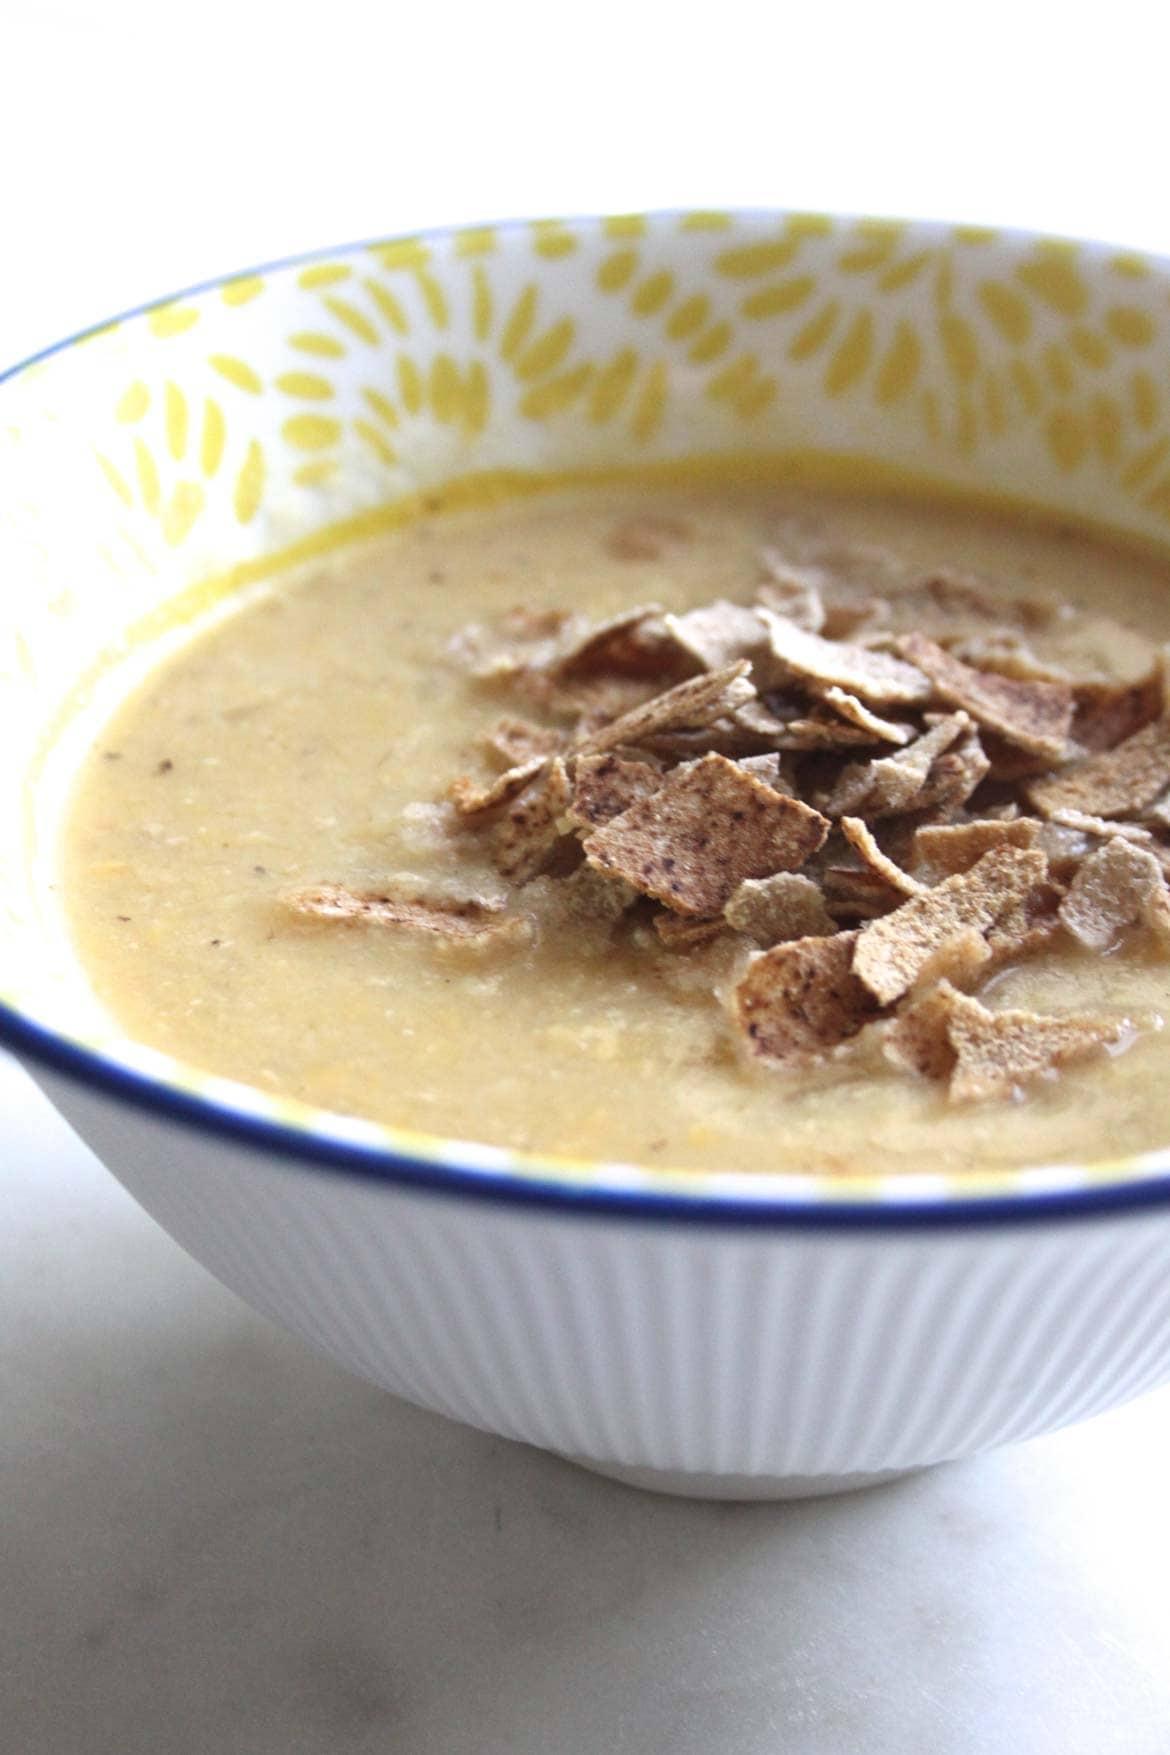 authentic lebanese red lentil soup recipe